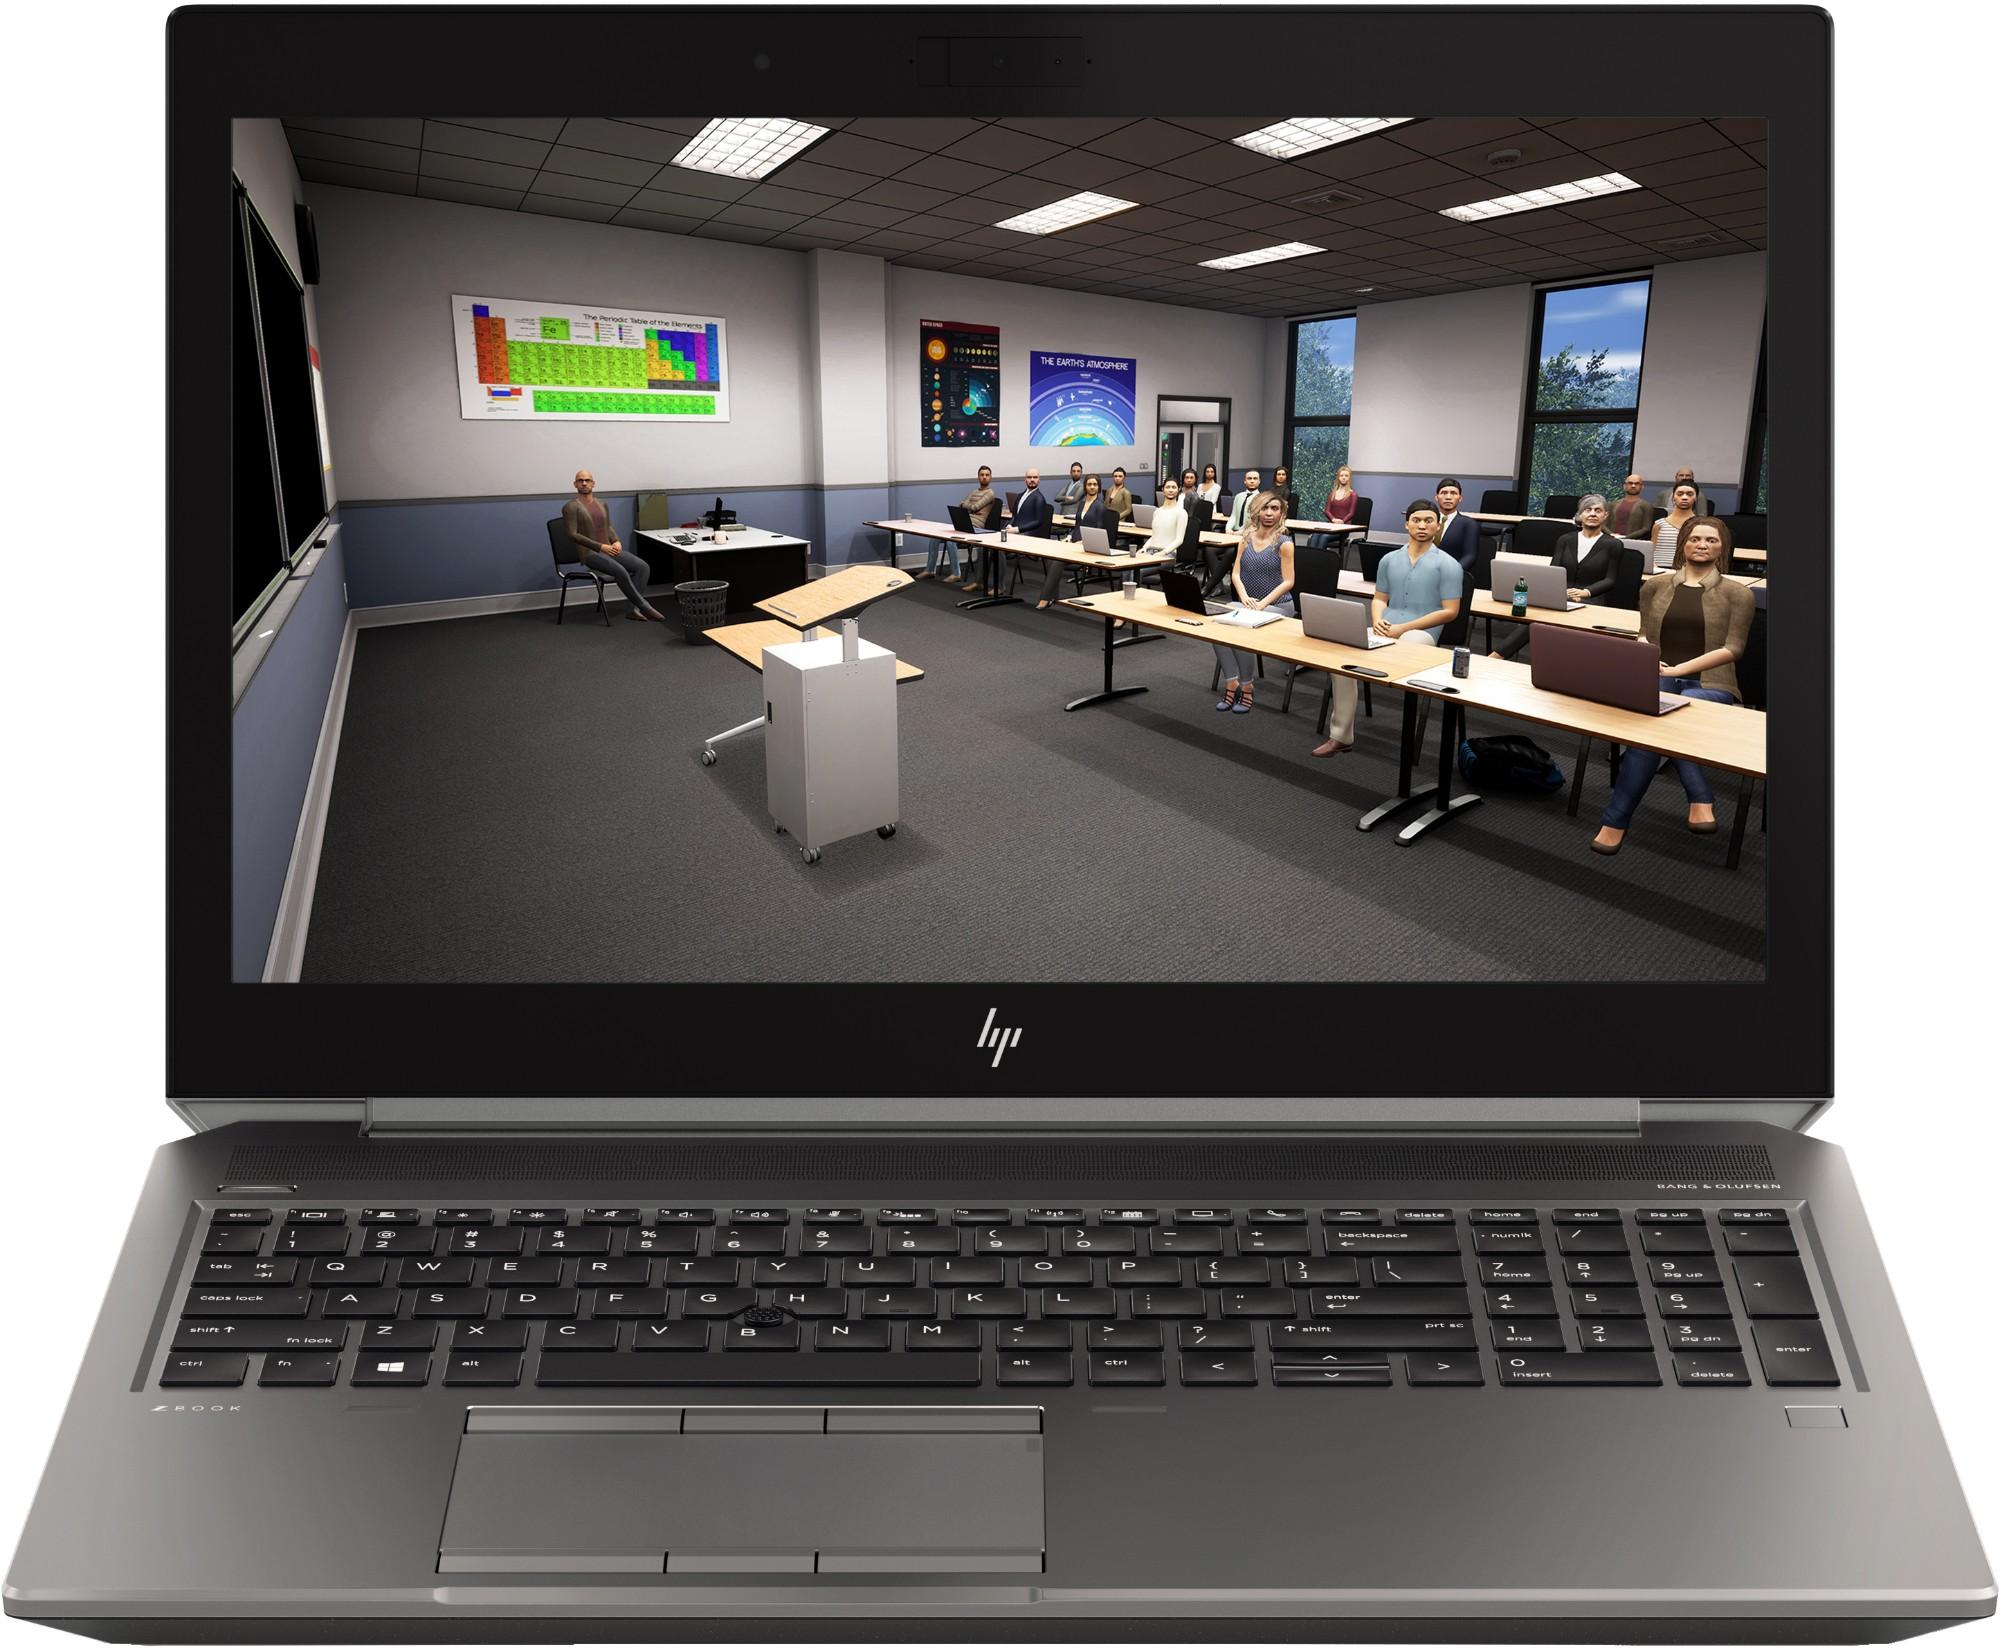 "HP ZBook 15 G6 Zilver Mobiel werkstation 39,6 cm (15.6"") 1920 x 1080 Pixels Intel Xeon E E-2286M 32 GB DDR4-SDRAM 512 GB SSD"